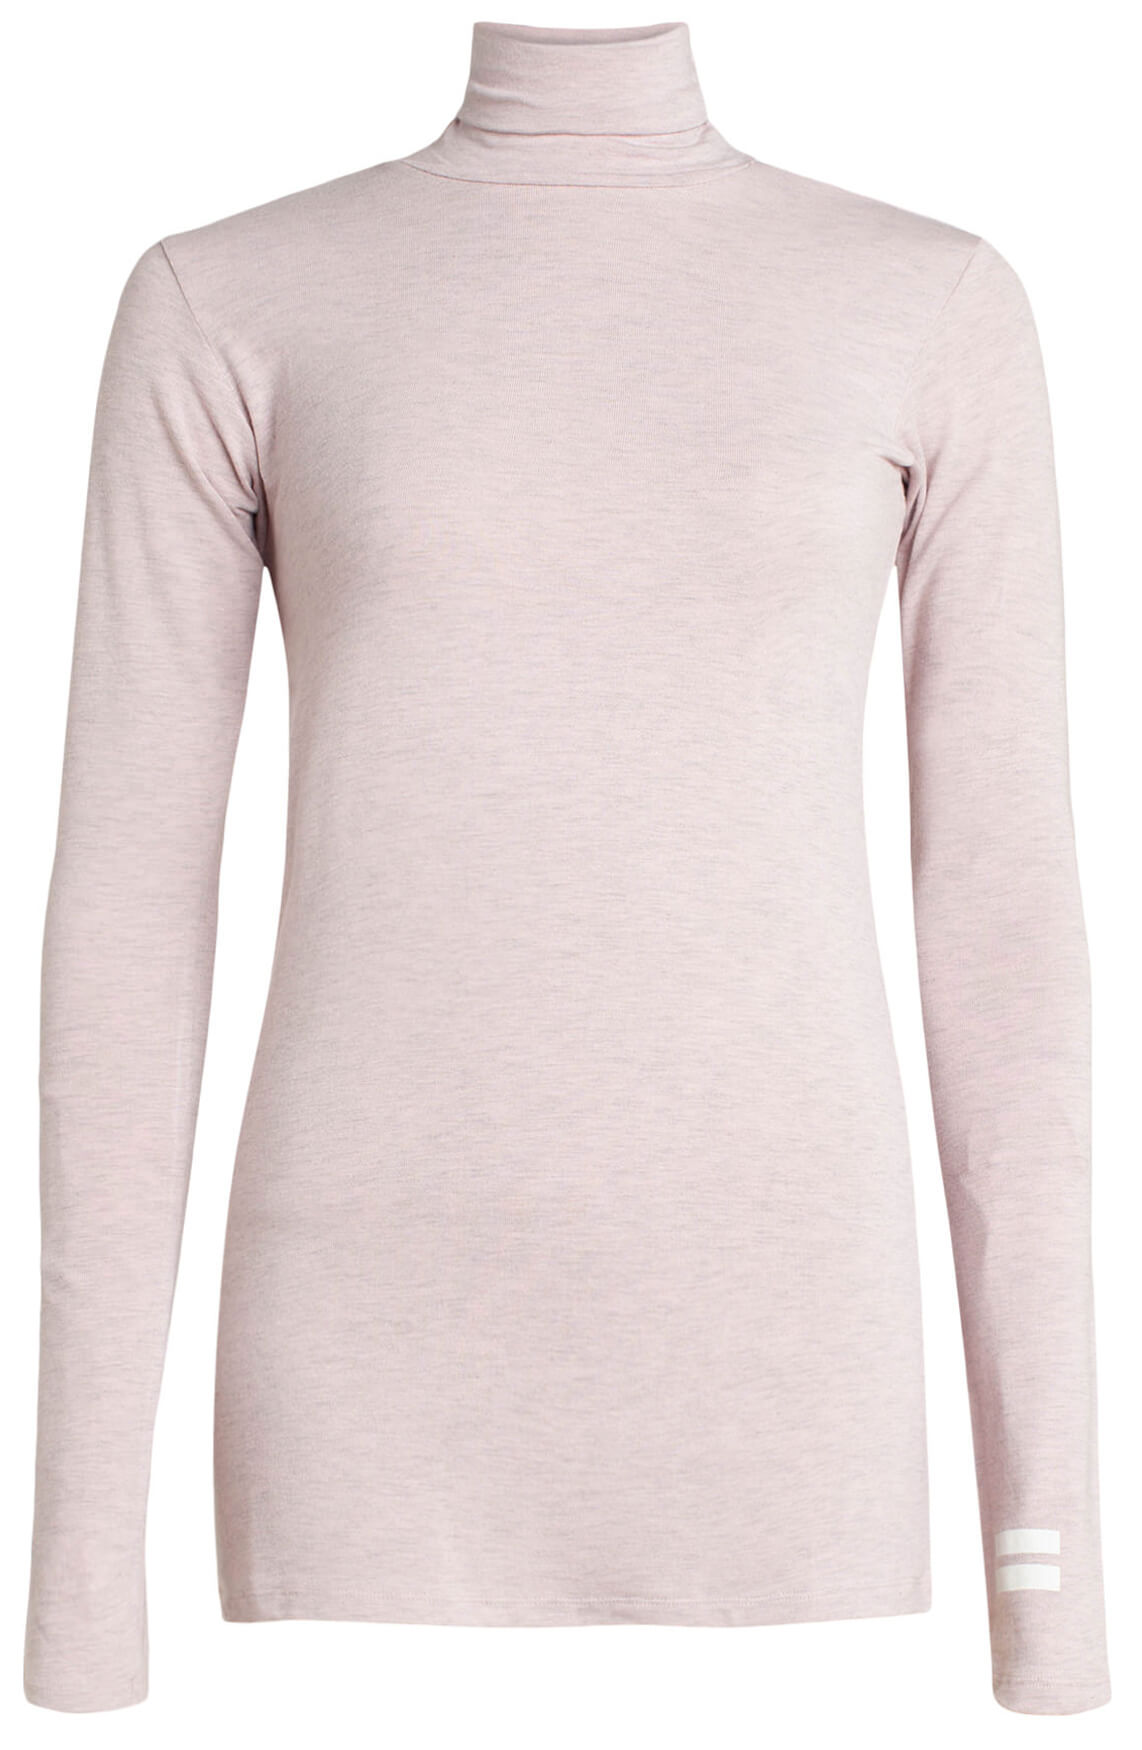 10 Days Dames Shirt met col roze